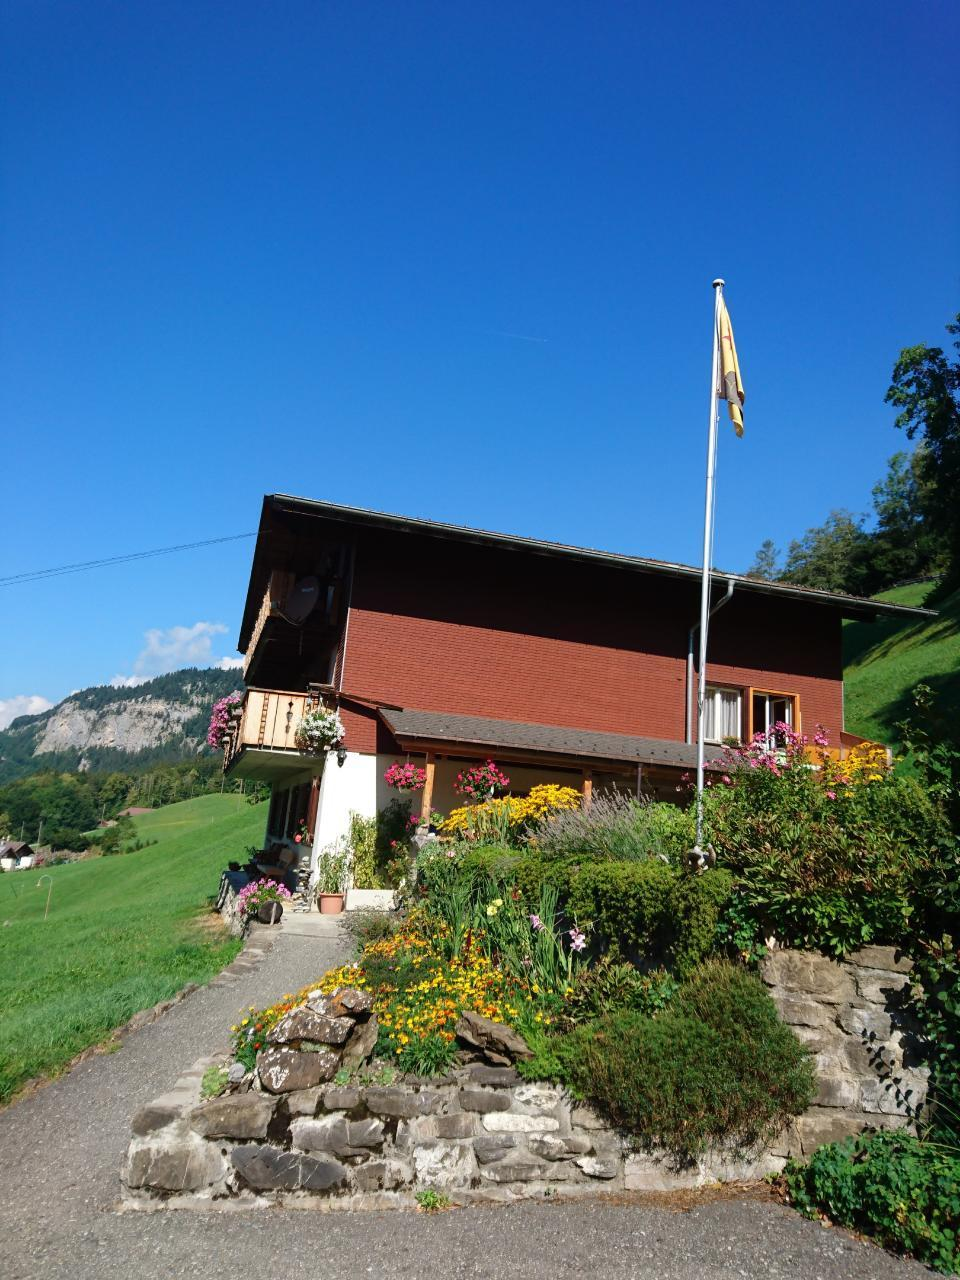 Ferienwohnung Obererli 4-Bettwohnung (2692316), Hasliberg Hohfluh, Meiringen - Hasliberg, Berner Oberland, Schweiz, Bild 1